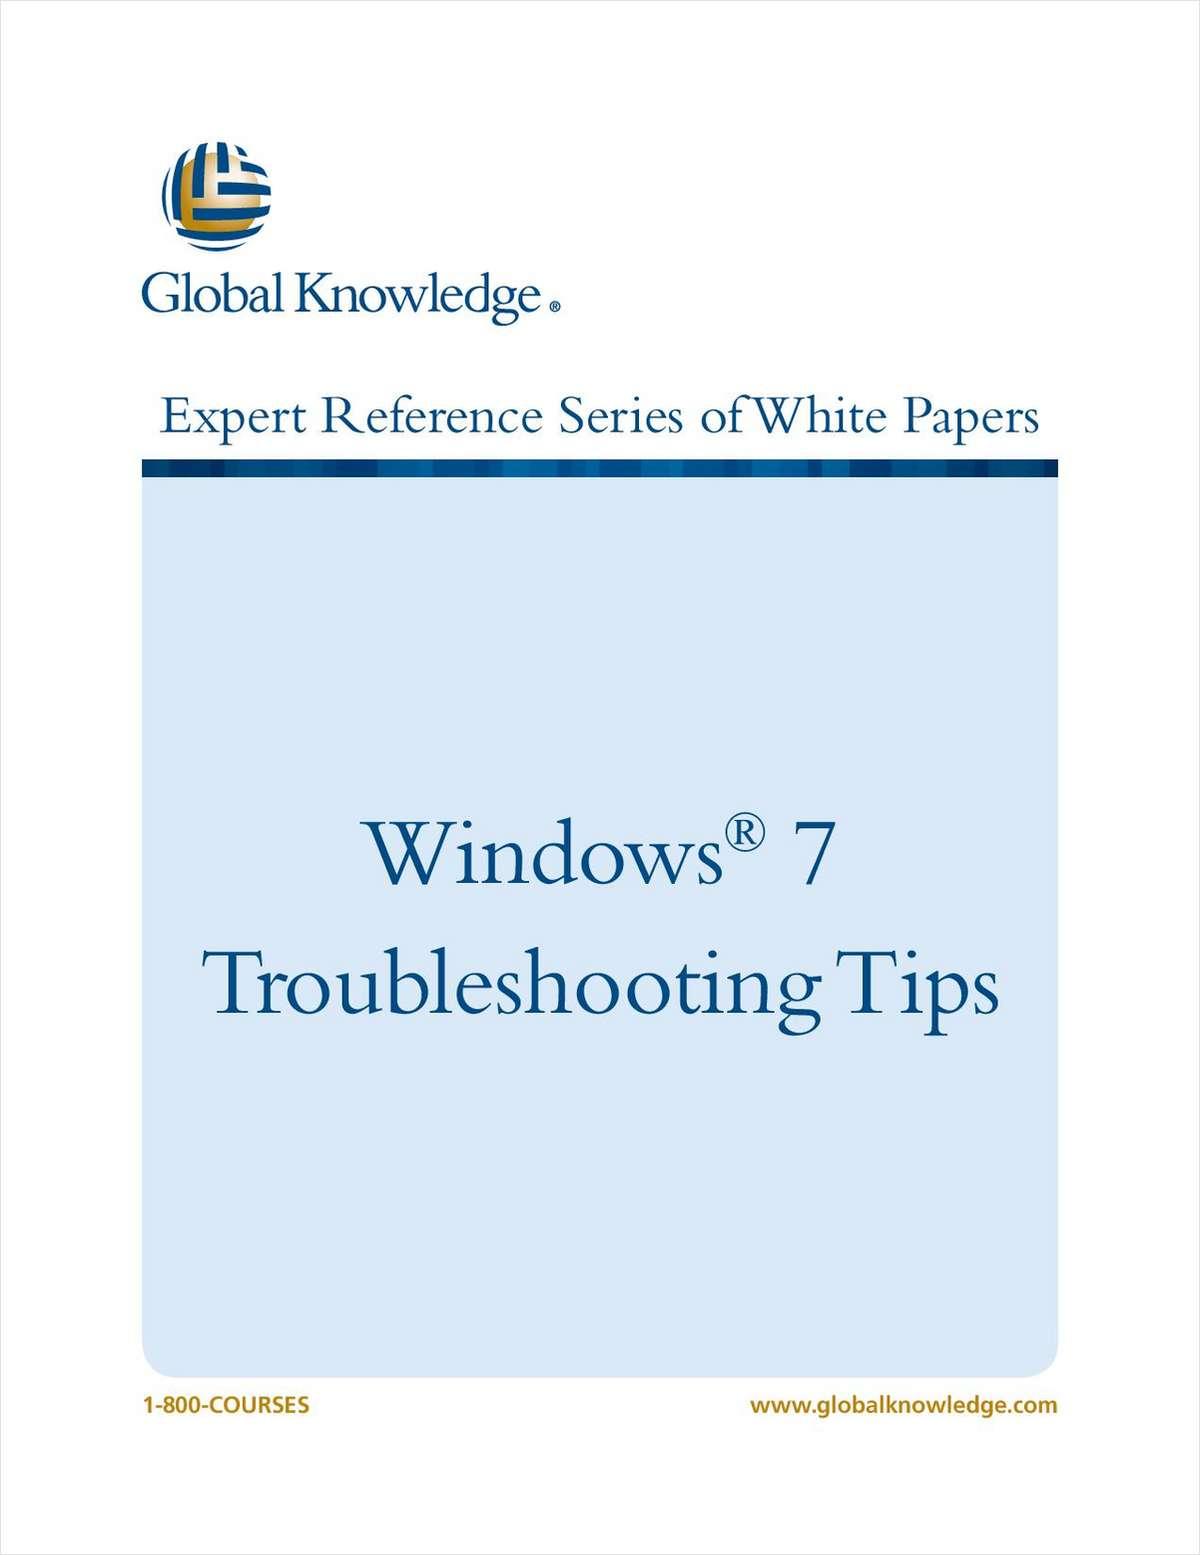 Windows 7 Troubleshooting Tips